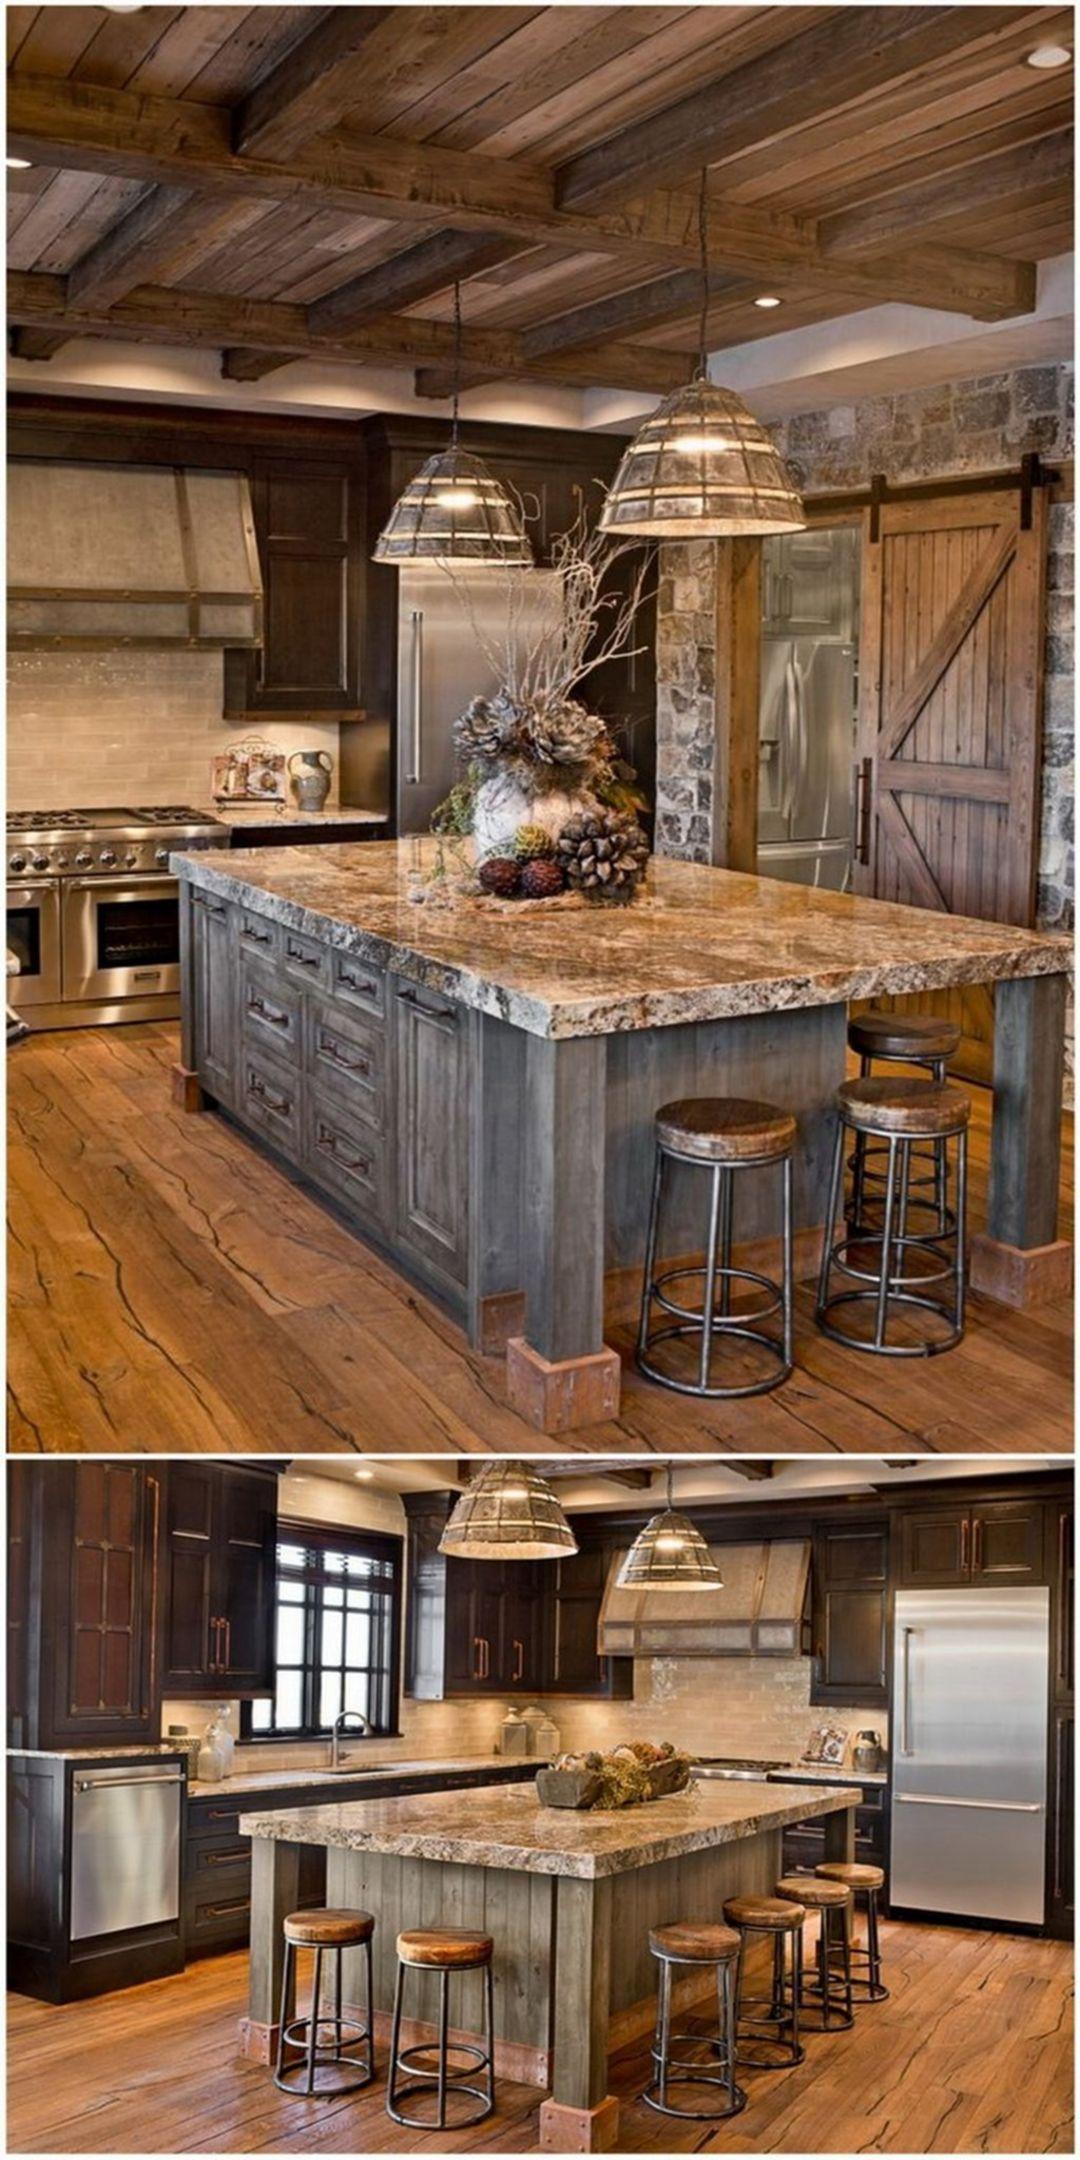 Pin di Micol Dall\'Agnol su Dream Home | Mobili rustici da cucina ...